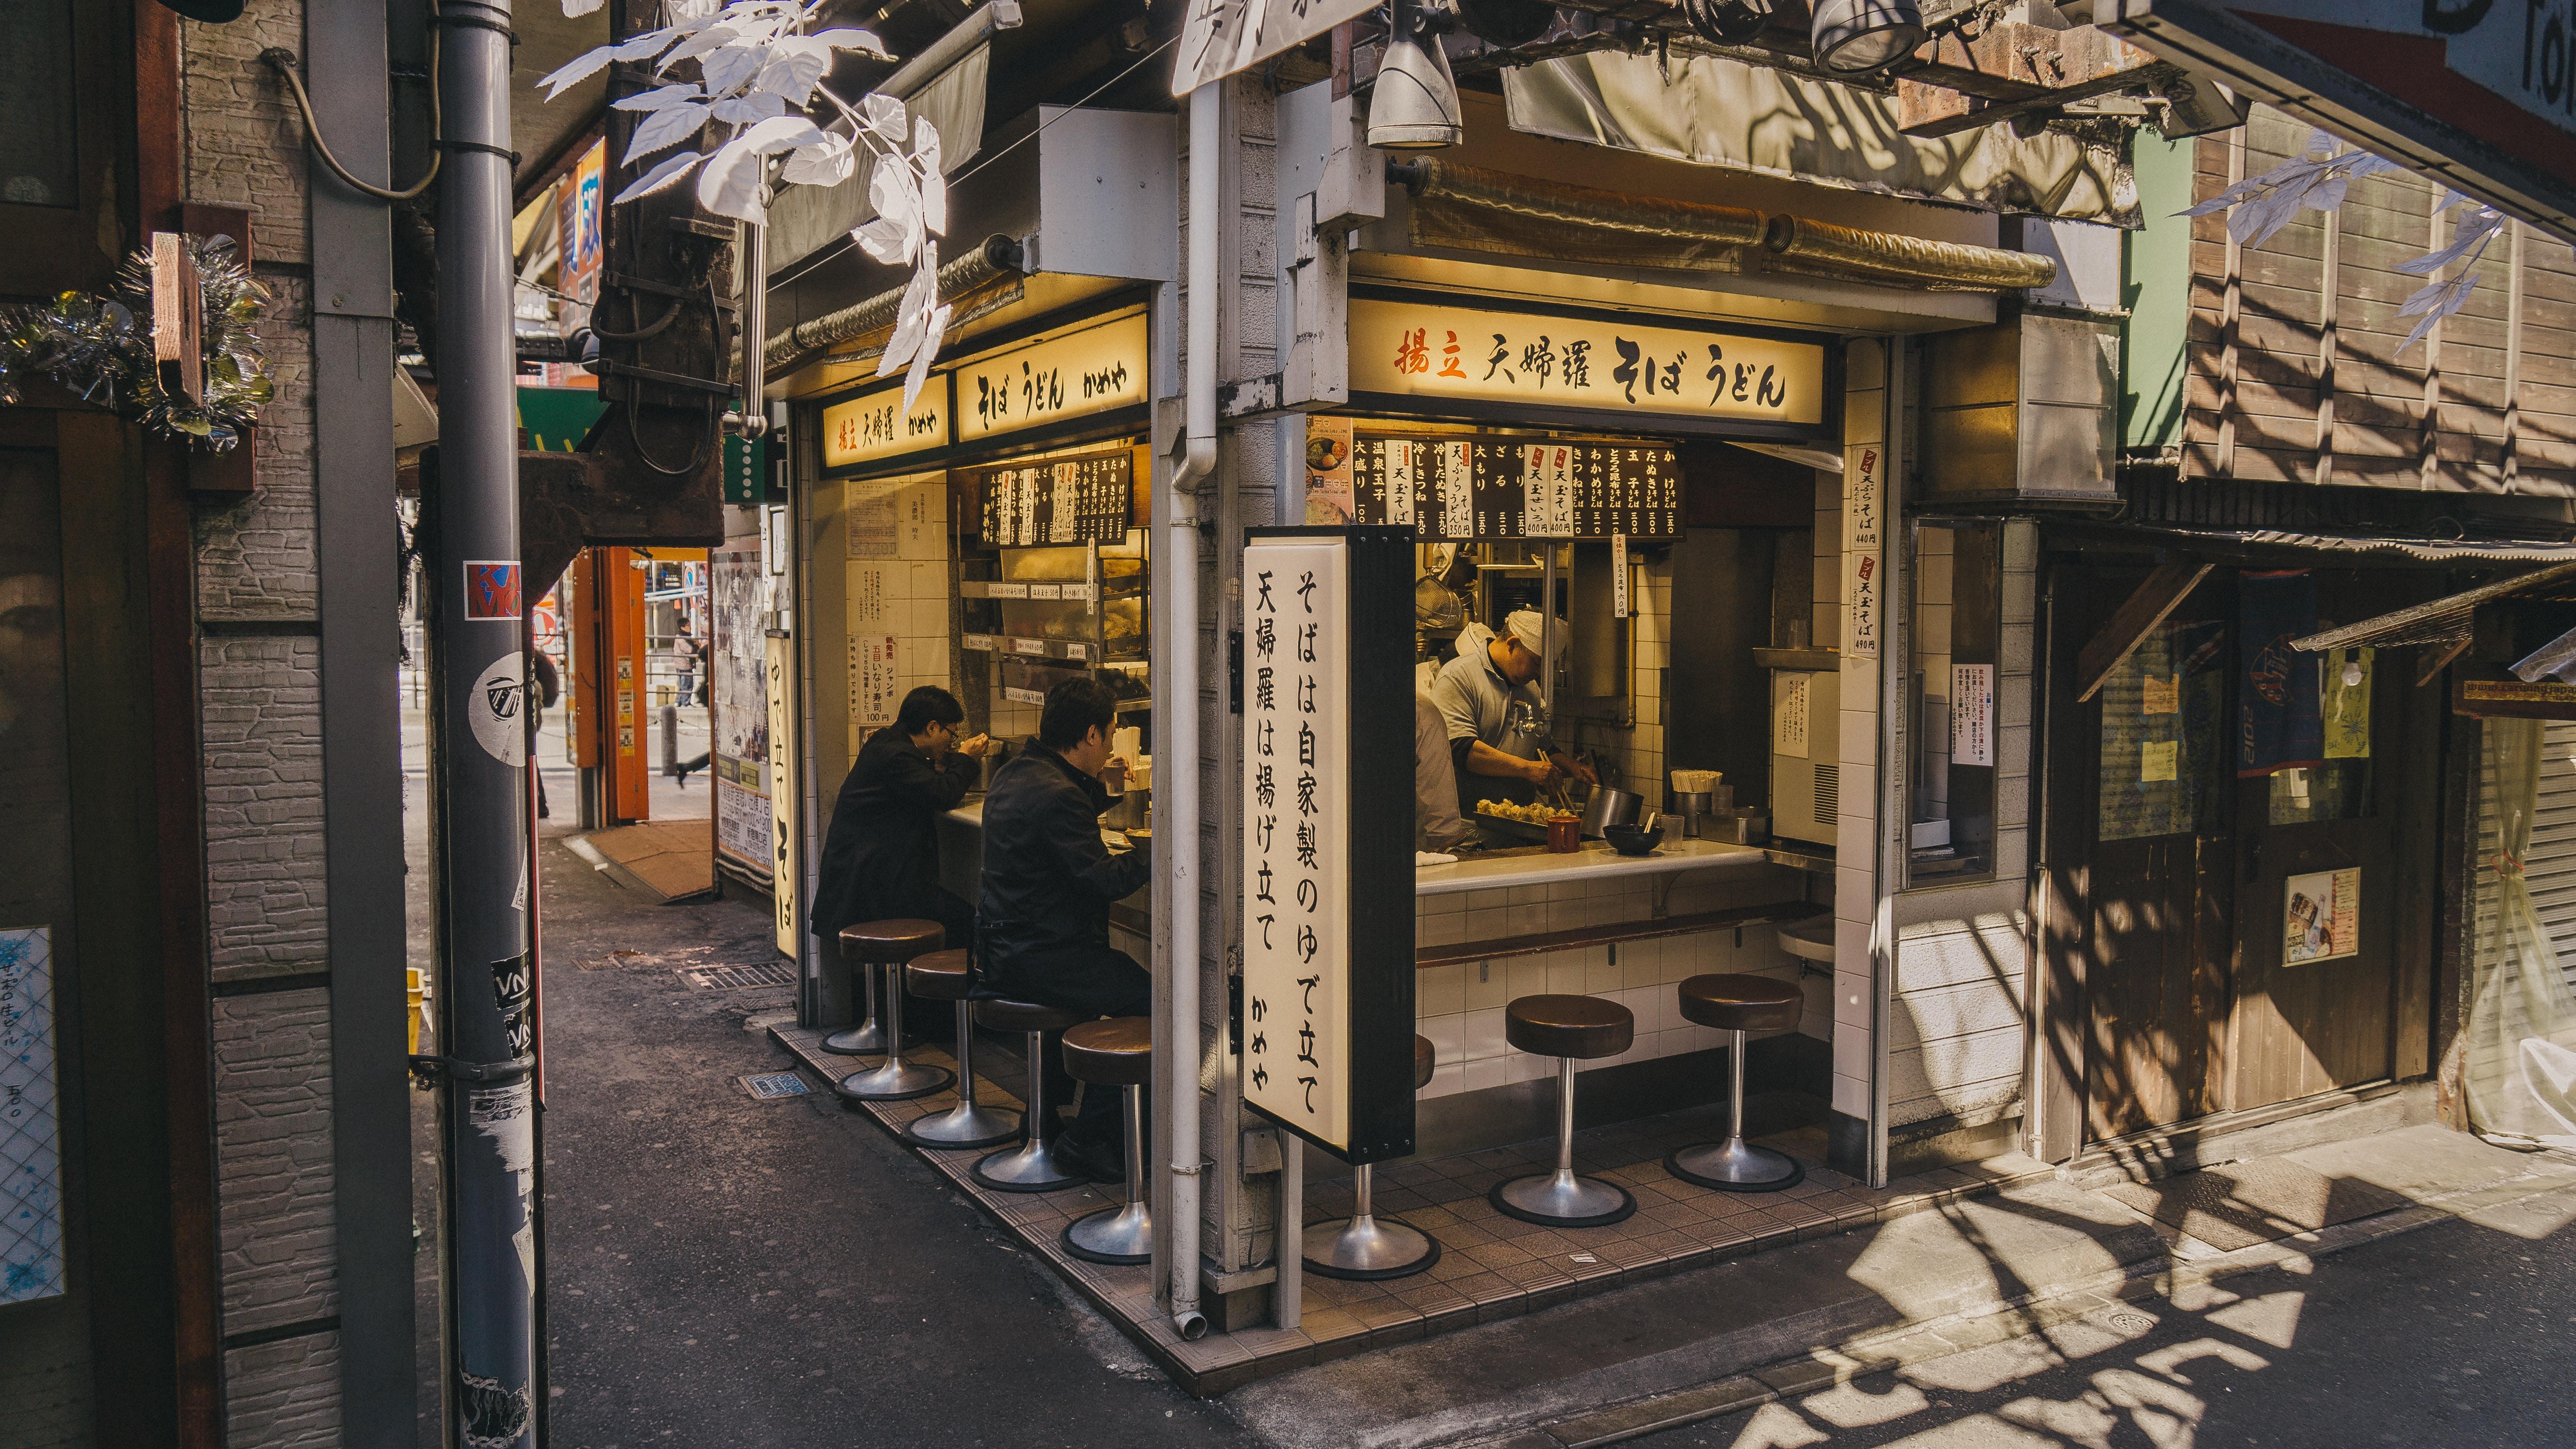 people eating inside stall beside street